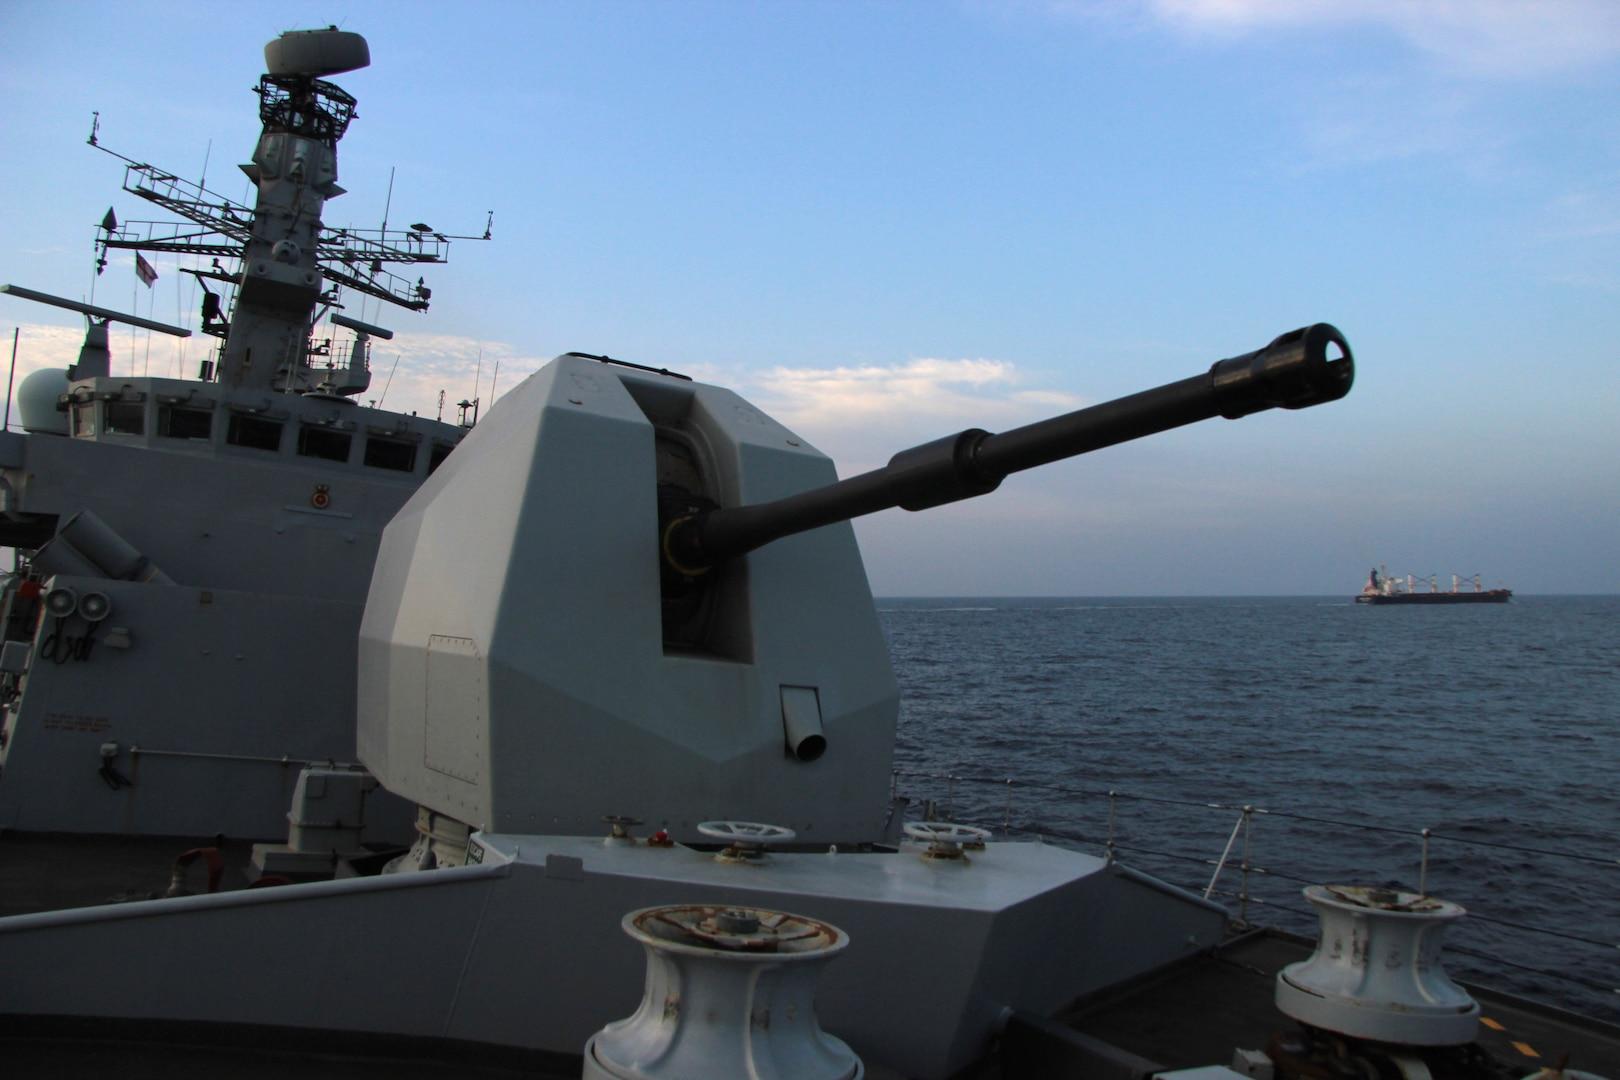 Merchant Vessel being reassured by HMS MONTROSE on IMSC Tasking